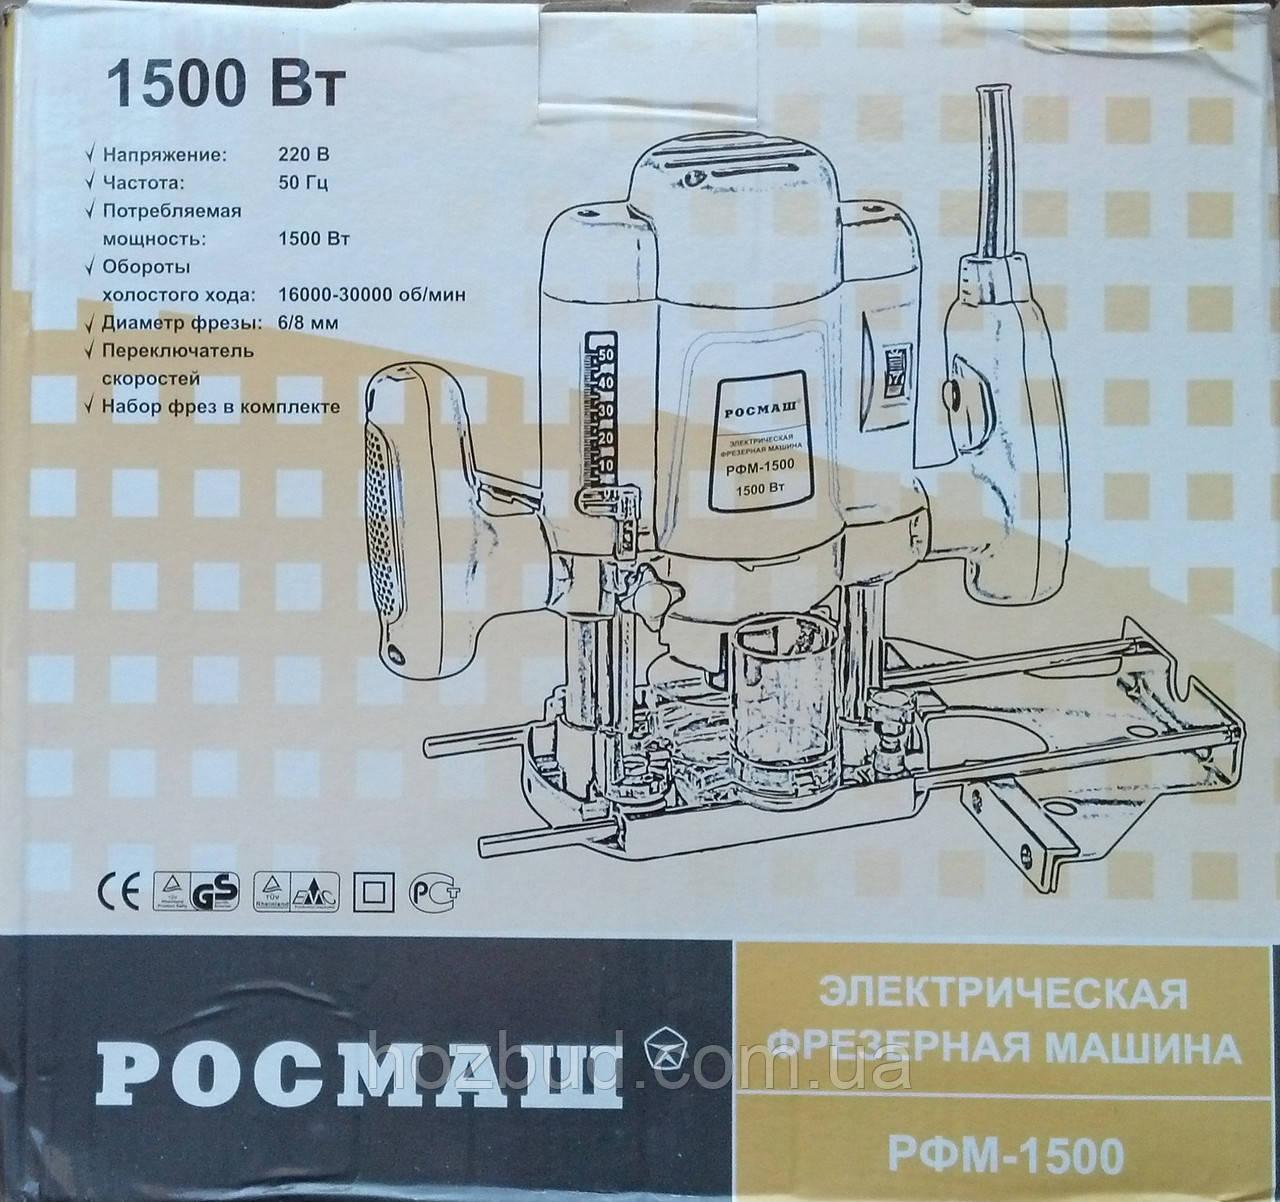 Фрезер РОСМАШ РФМ-1500